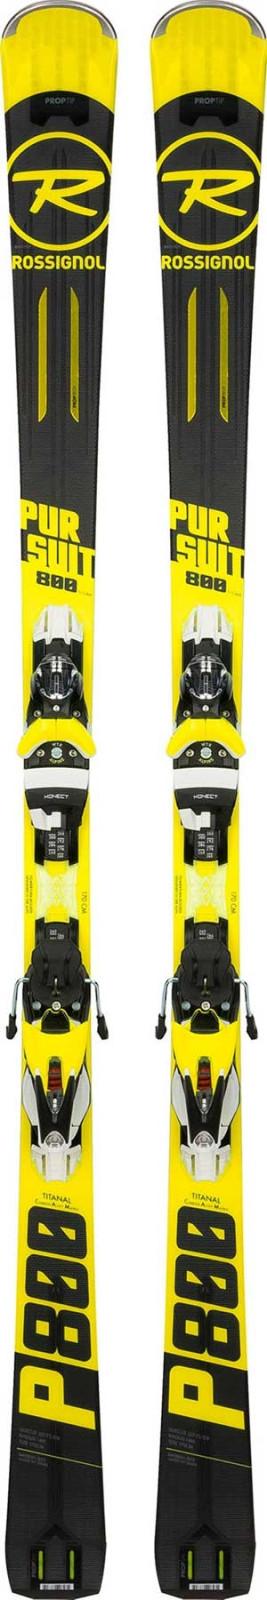 Rossignol Pursuit 800 Ti Cam Konect + SPX 12 Konect Dual Wtr B80